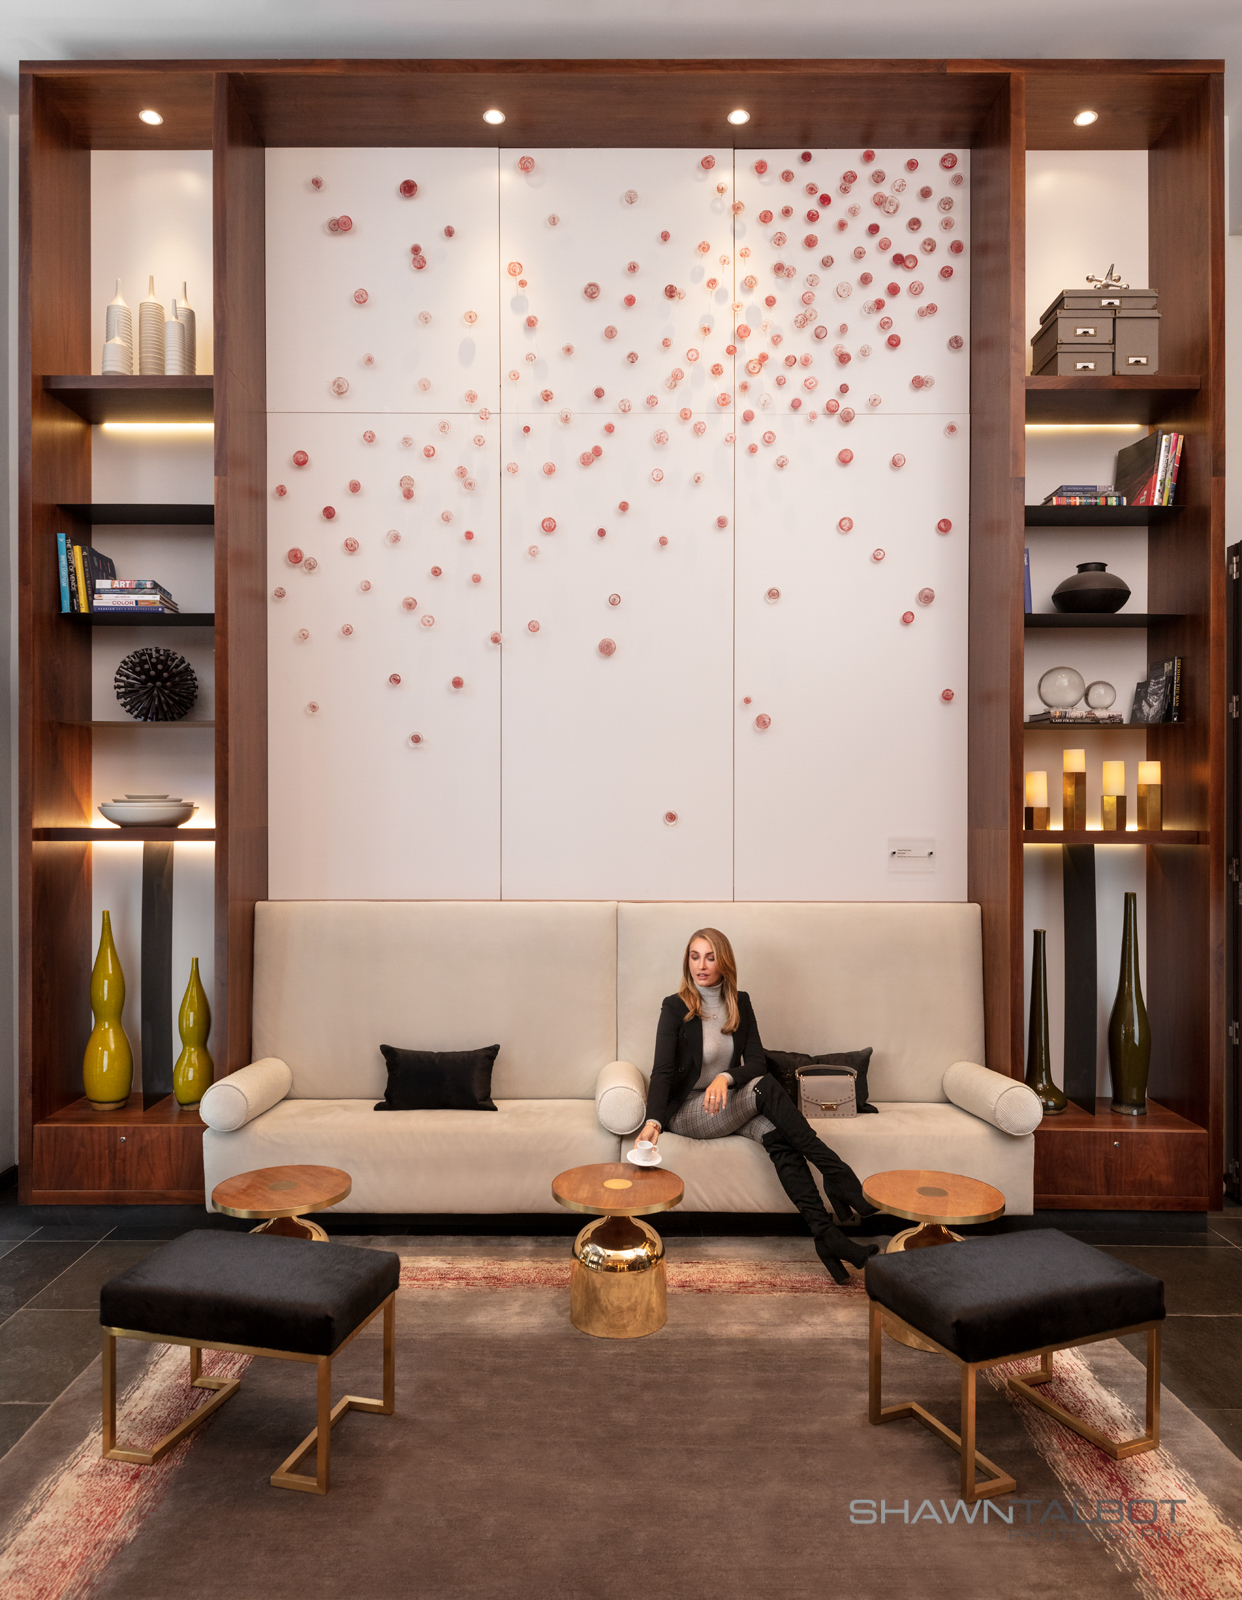 Shawn Talbot Architectural Photographer Toronto Hotel Interior